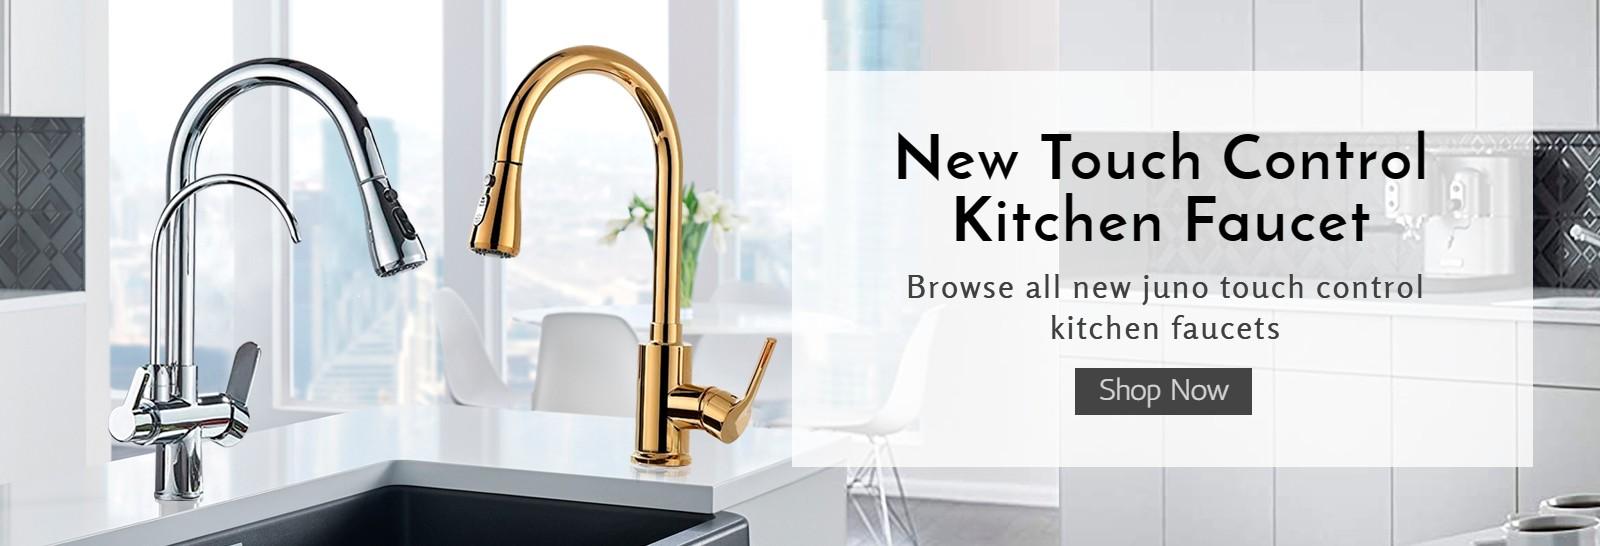 Touch Control Kitchen Faucet